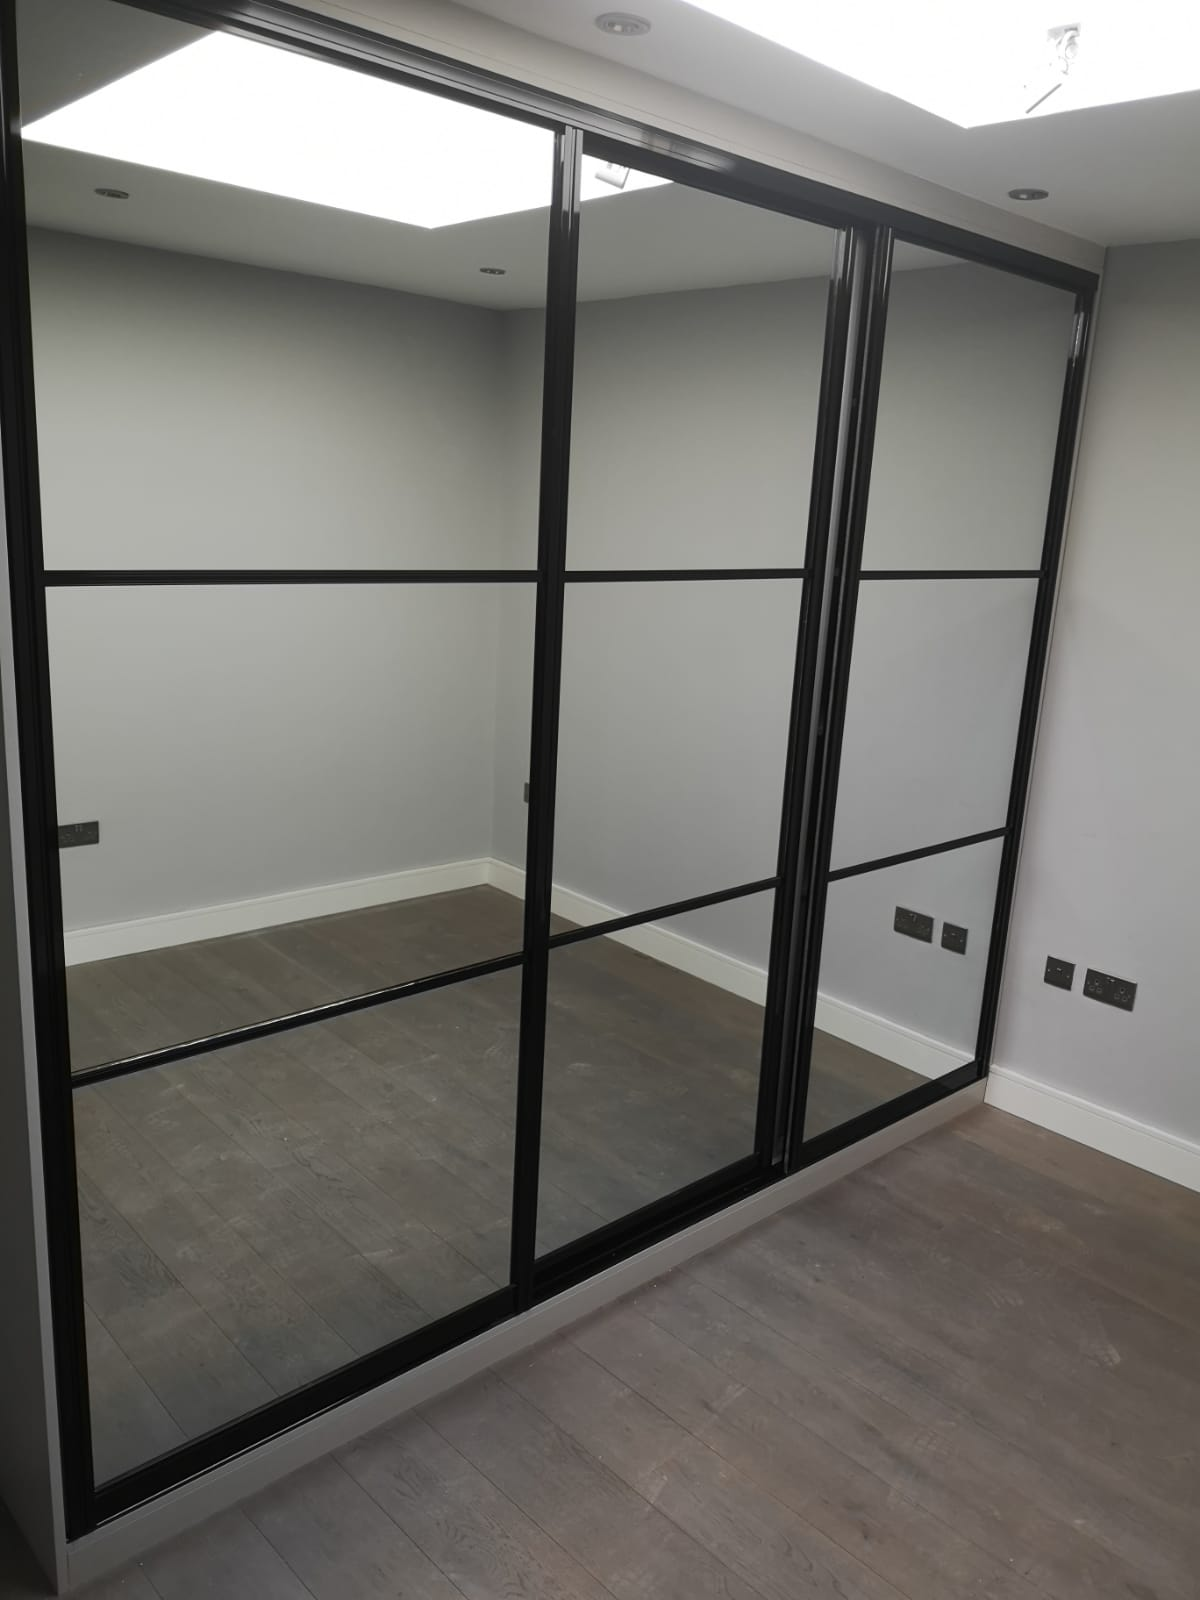 3 Panelled Sliding Wardrobe inframe & Premium Vanity Mirrors